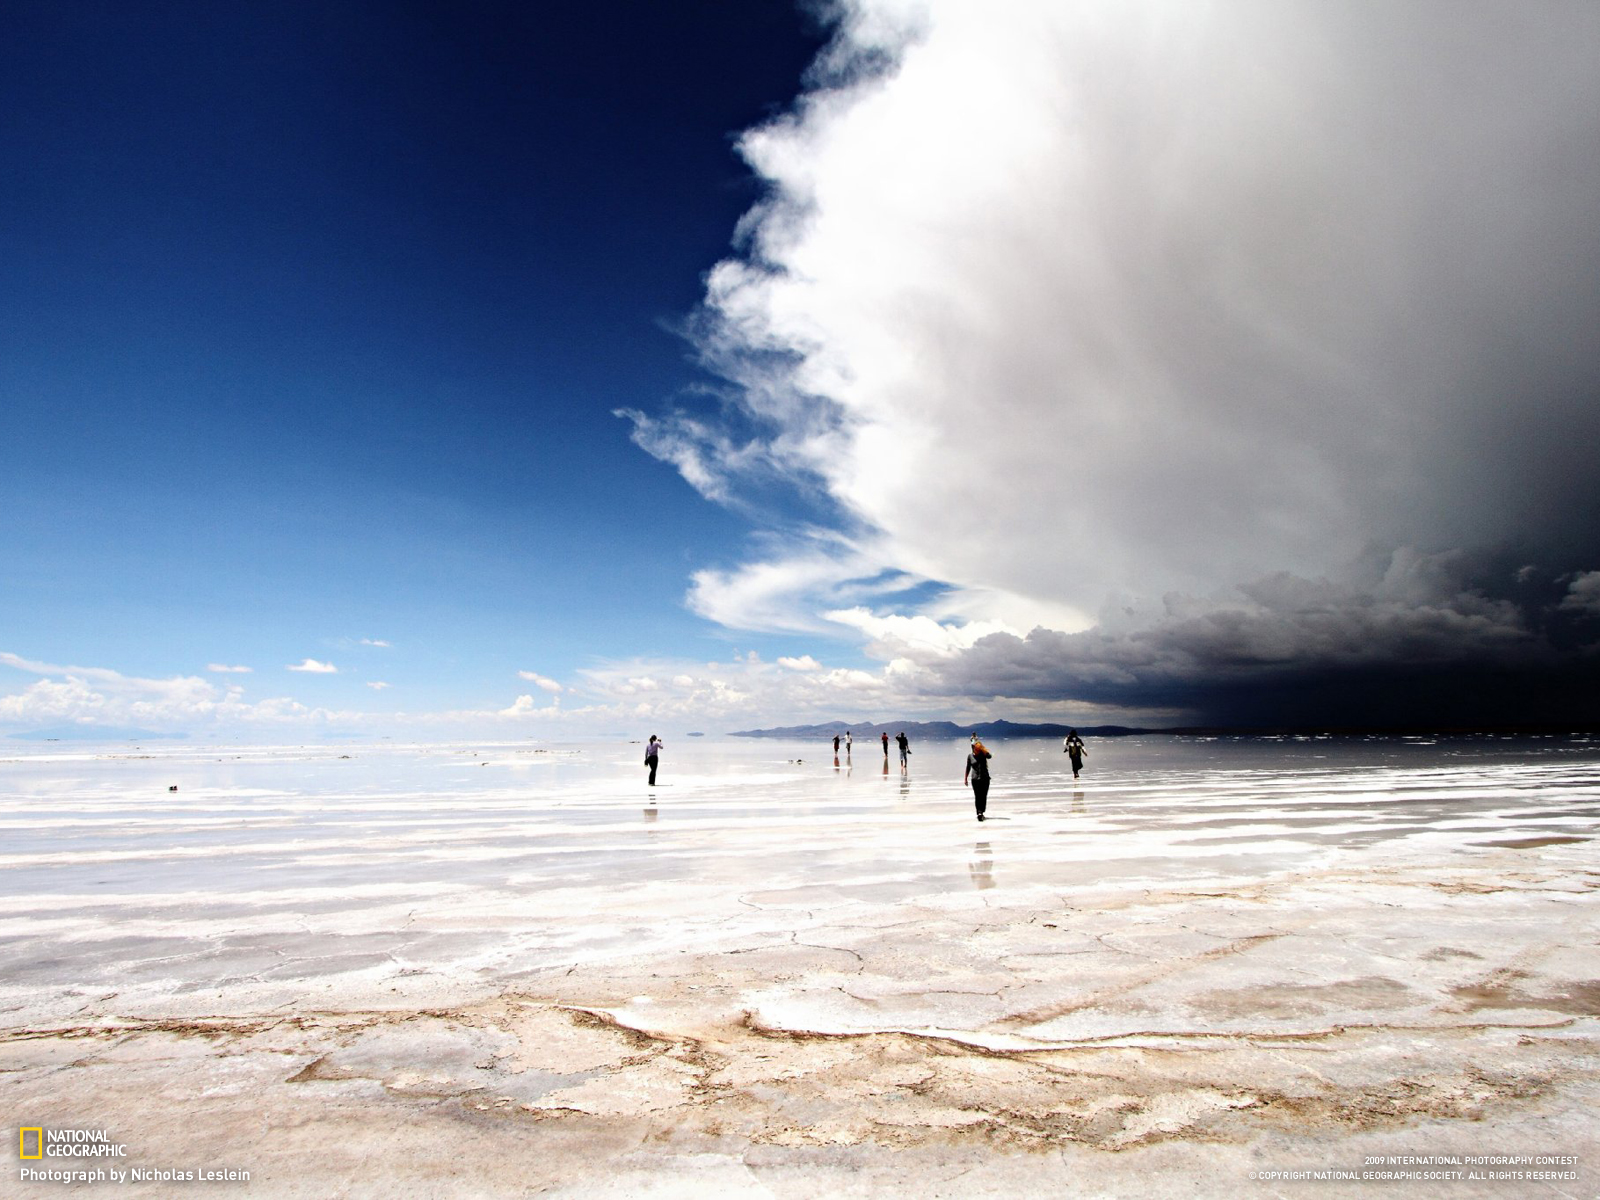 Wisteria Falls Wallpaper My Little Travel Log 12 Salt Desert Uyuni Bolivia